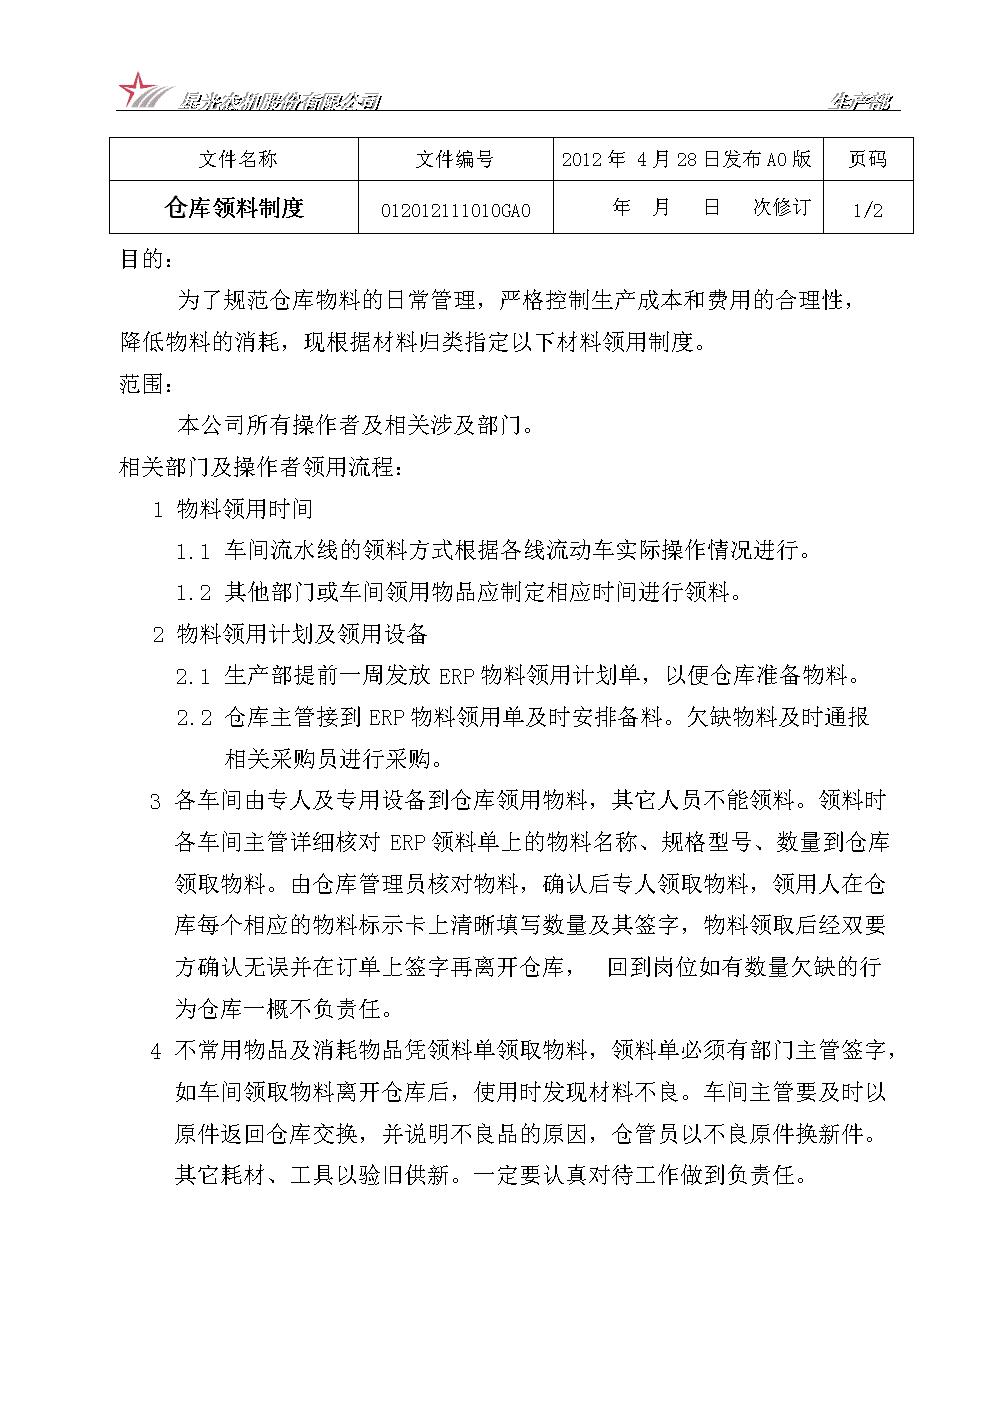 b倉庫領料制度.doc